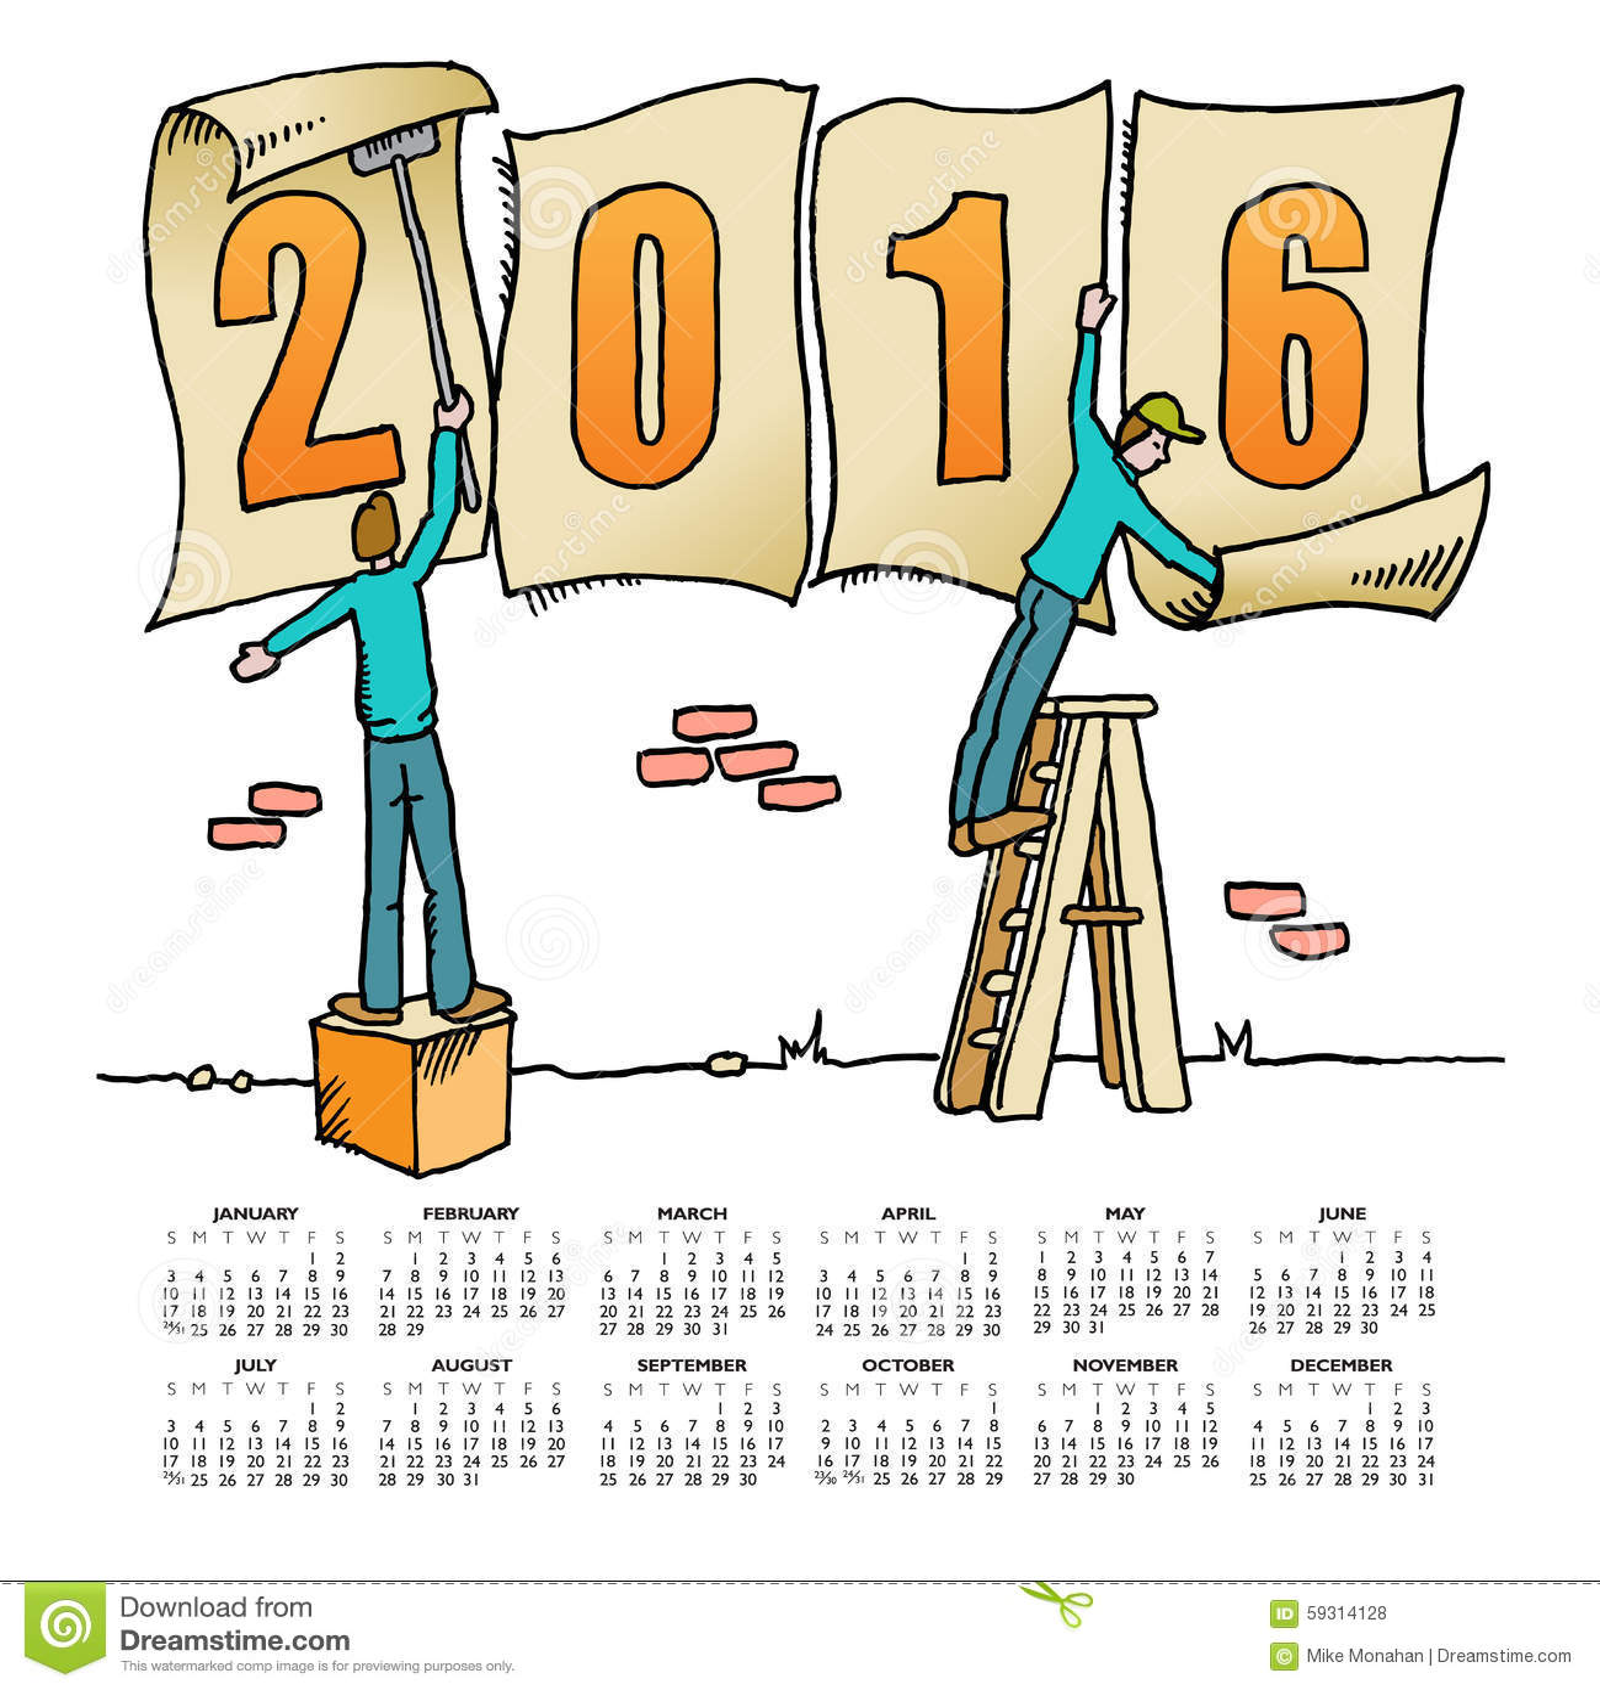 Calendar Drawing Cartoon : Whimsical drawing calendar vector illustration